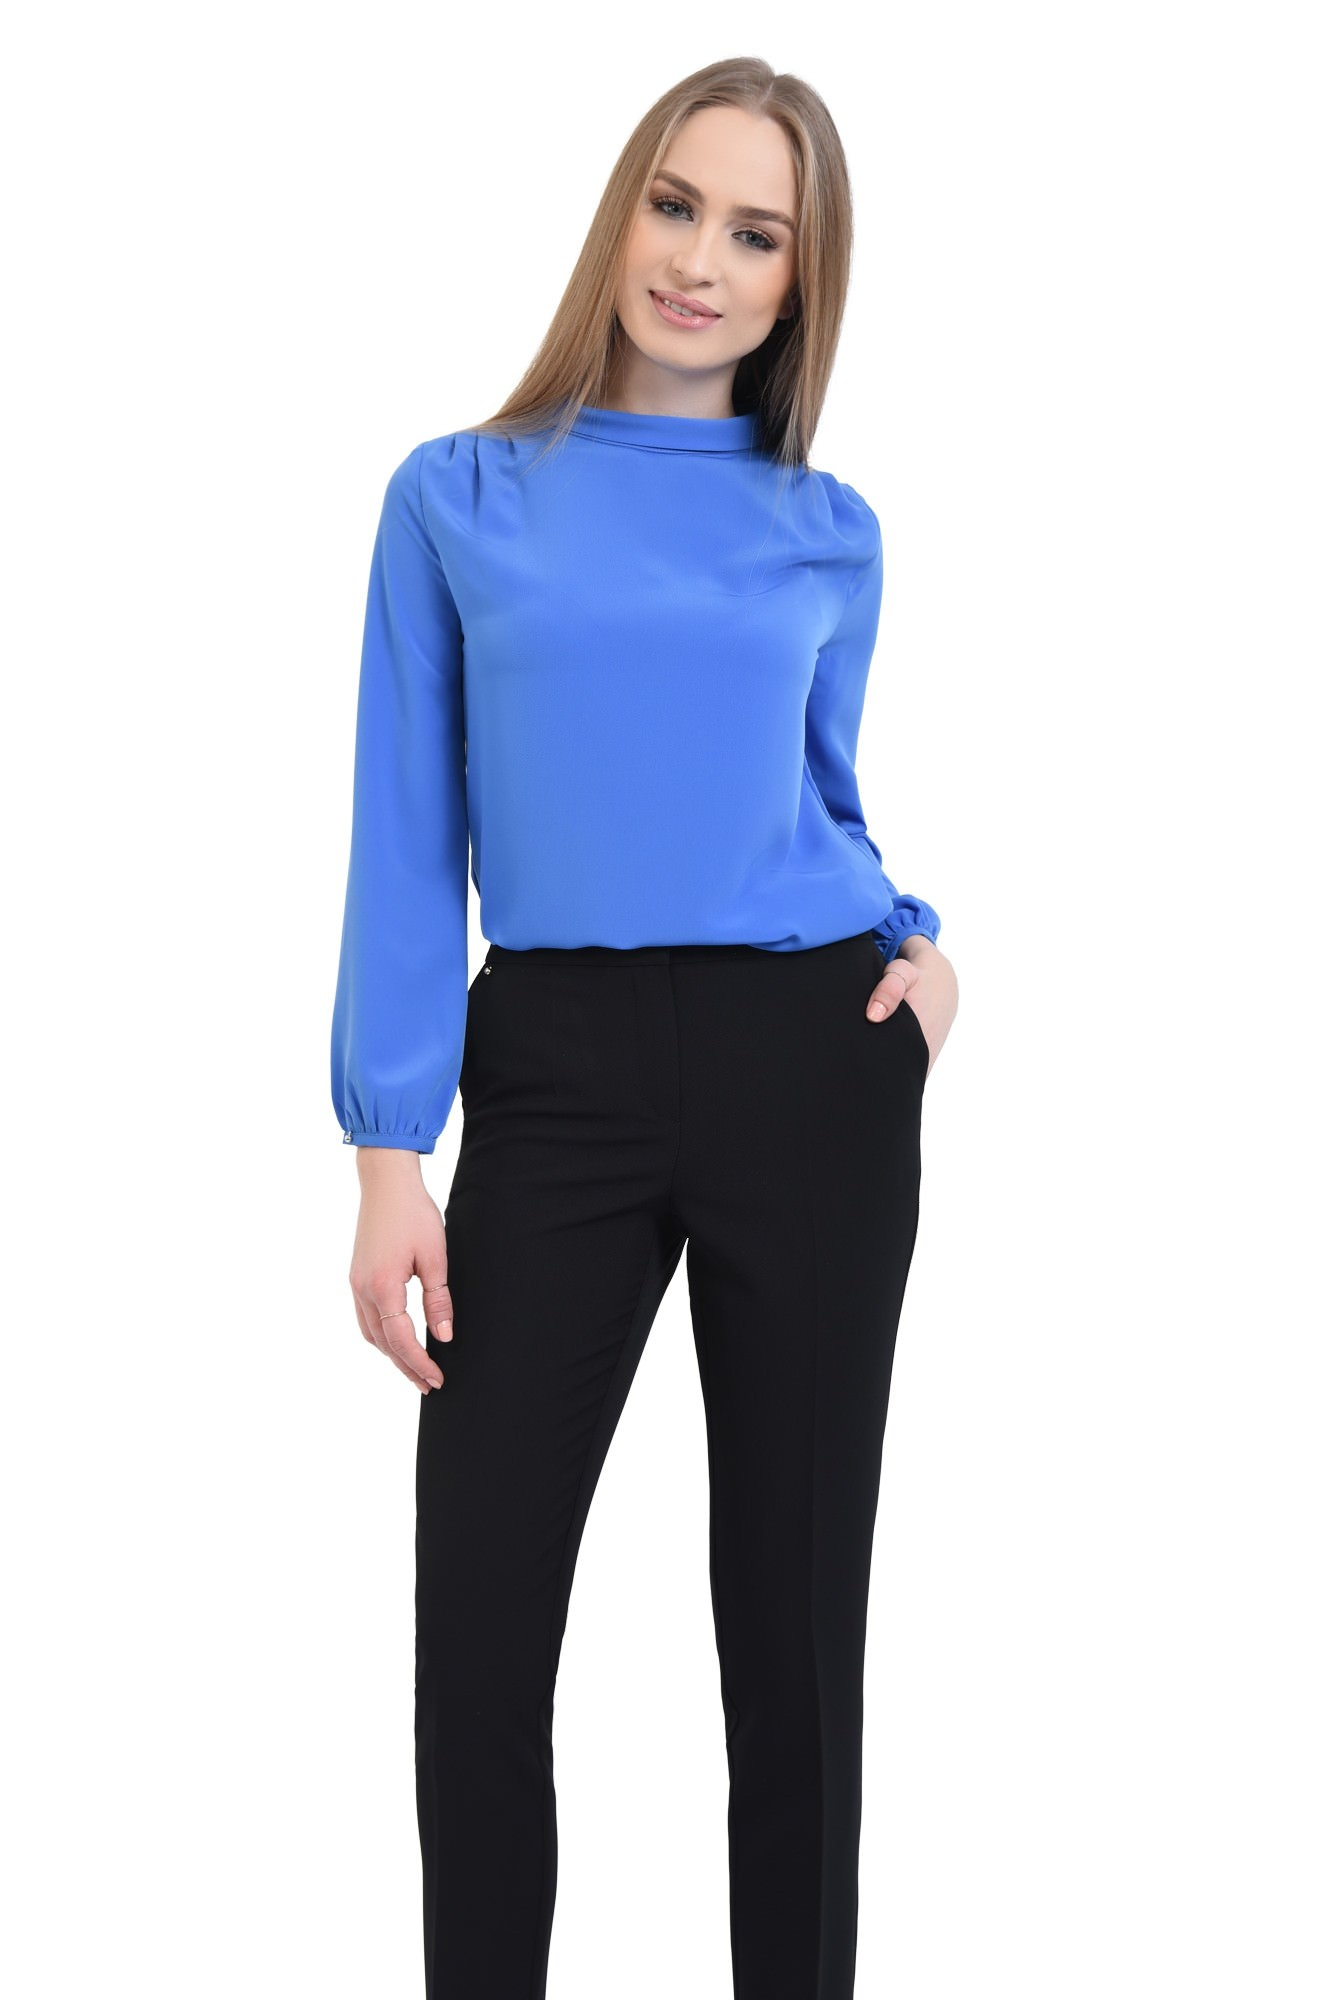 0 - Bluza office, albastru